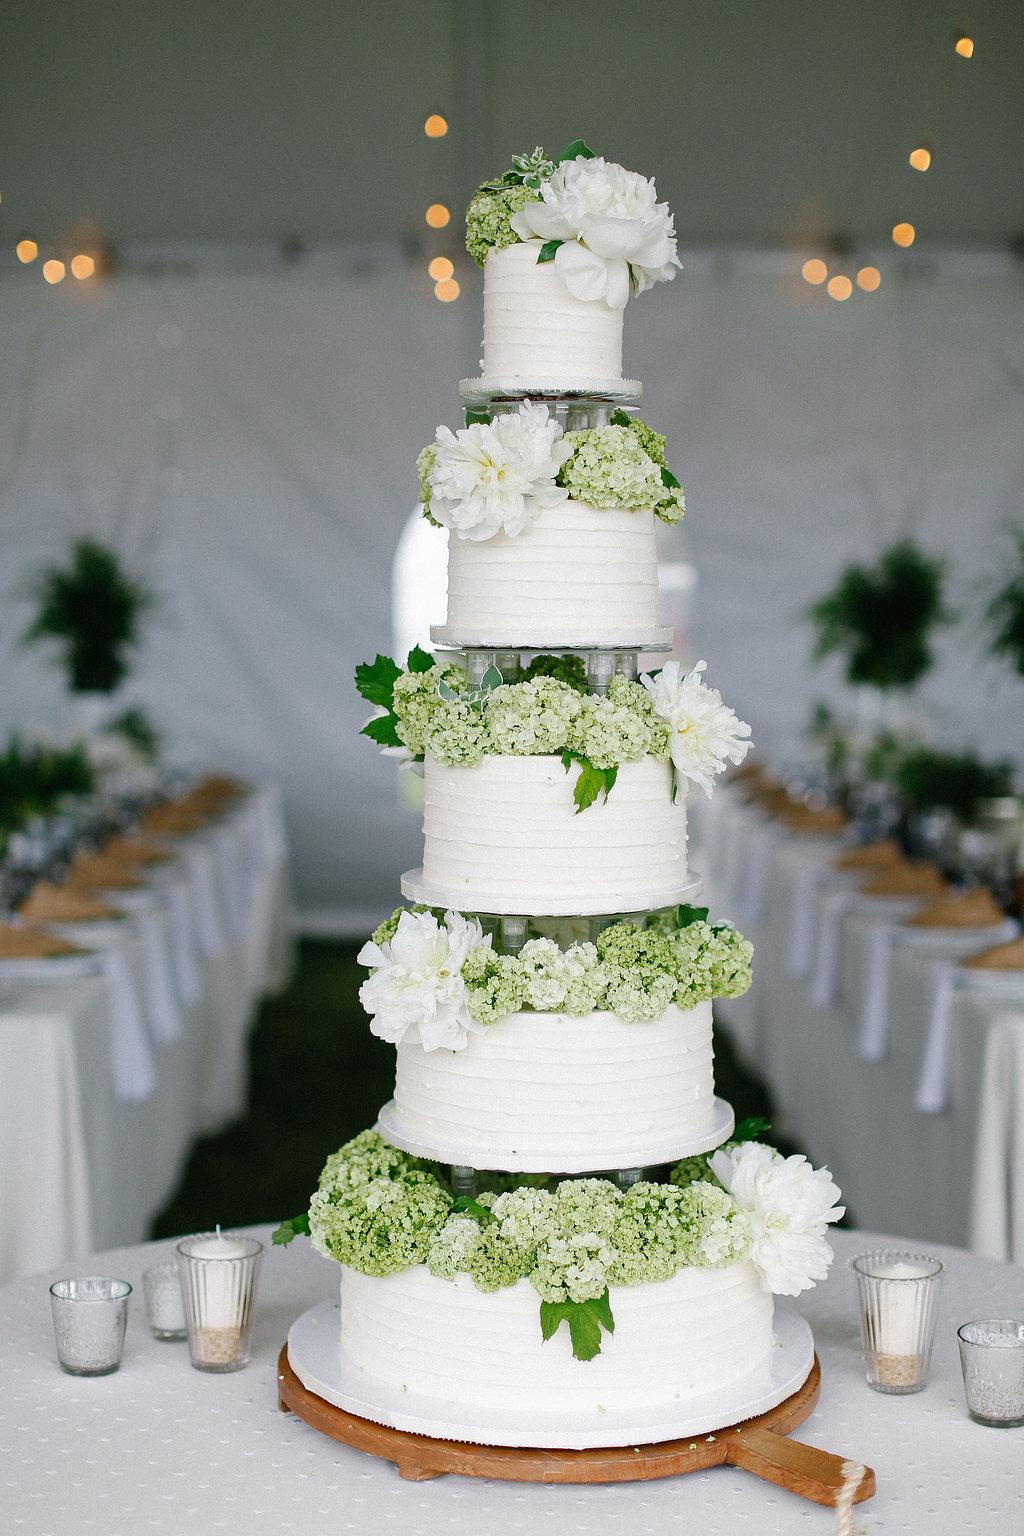 White tall wedding cake with fresh green hydrangea and white peony flowers